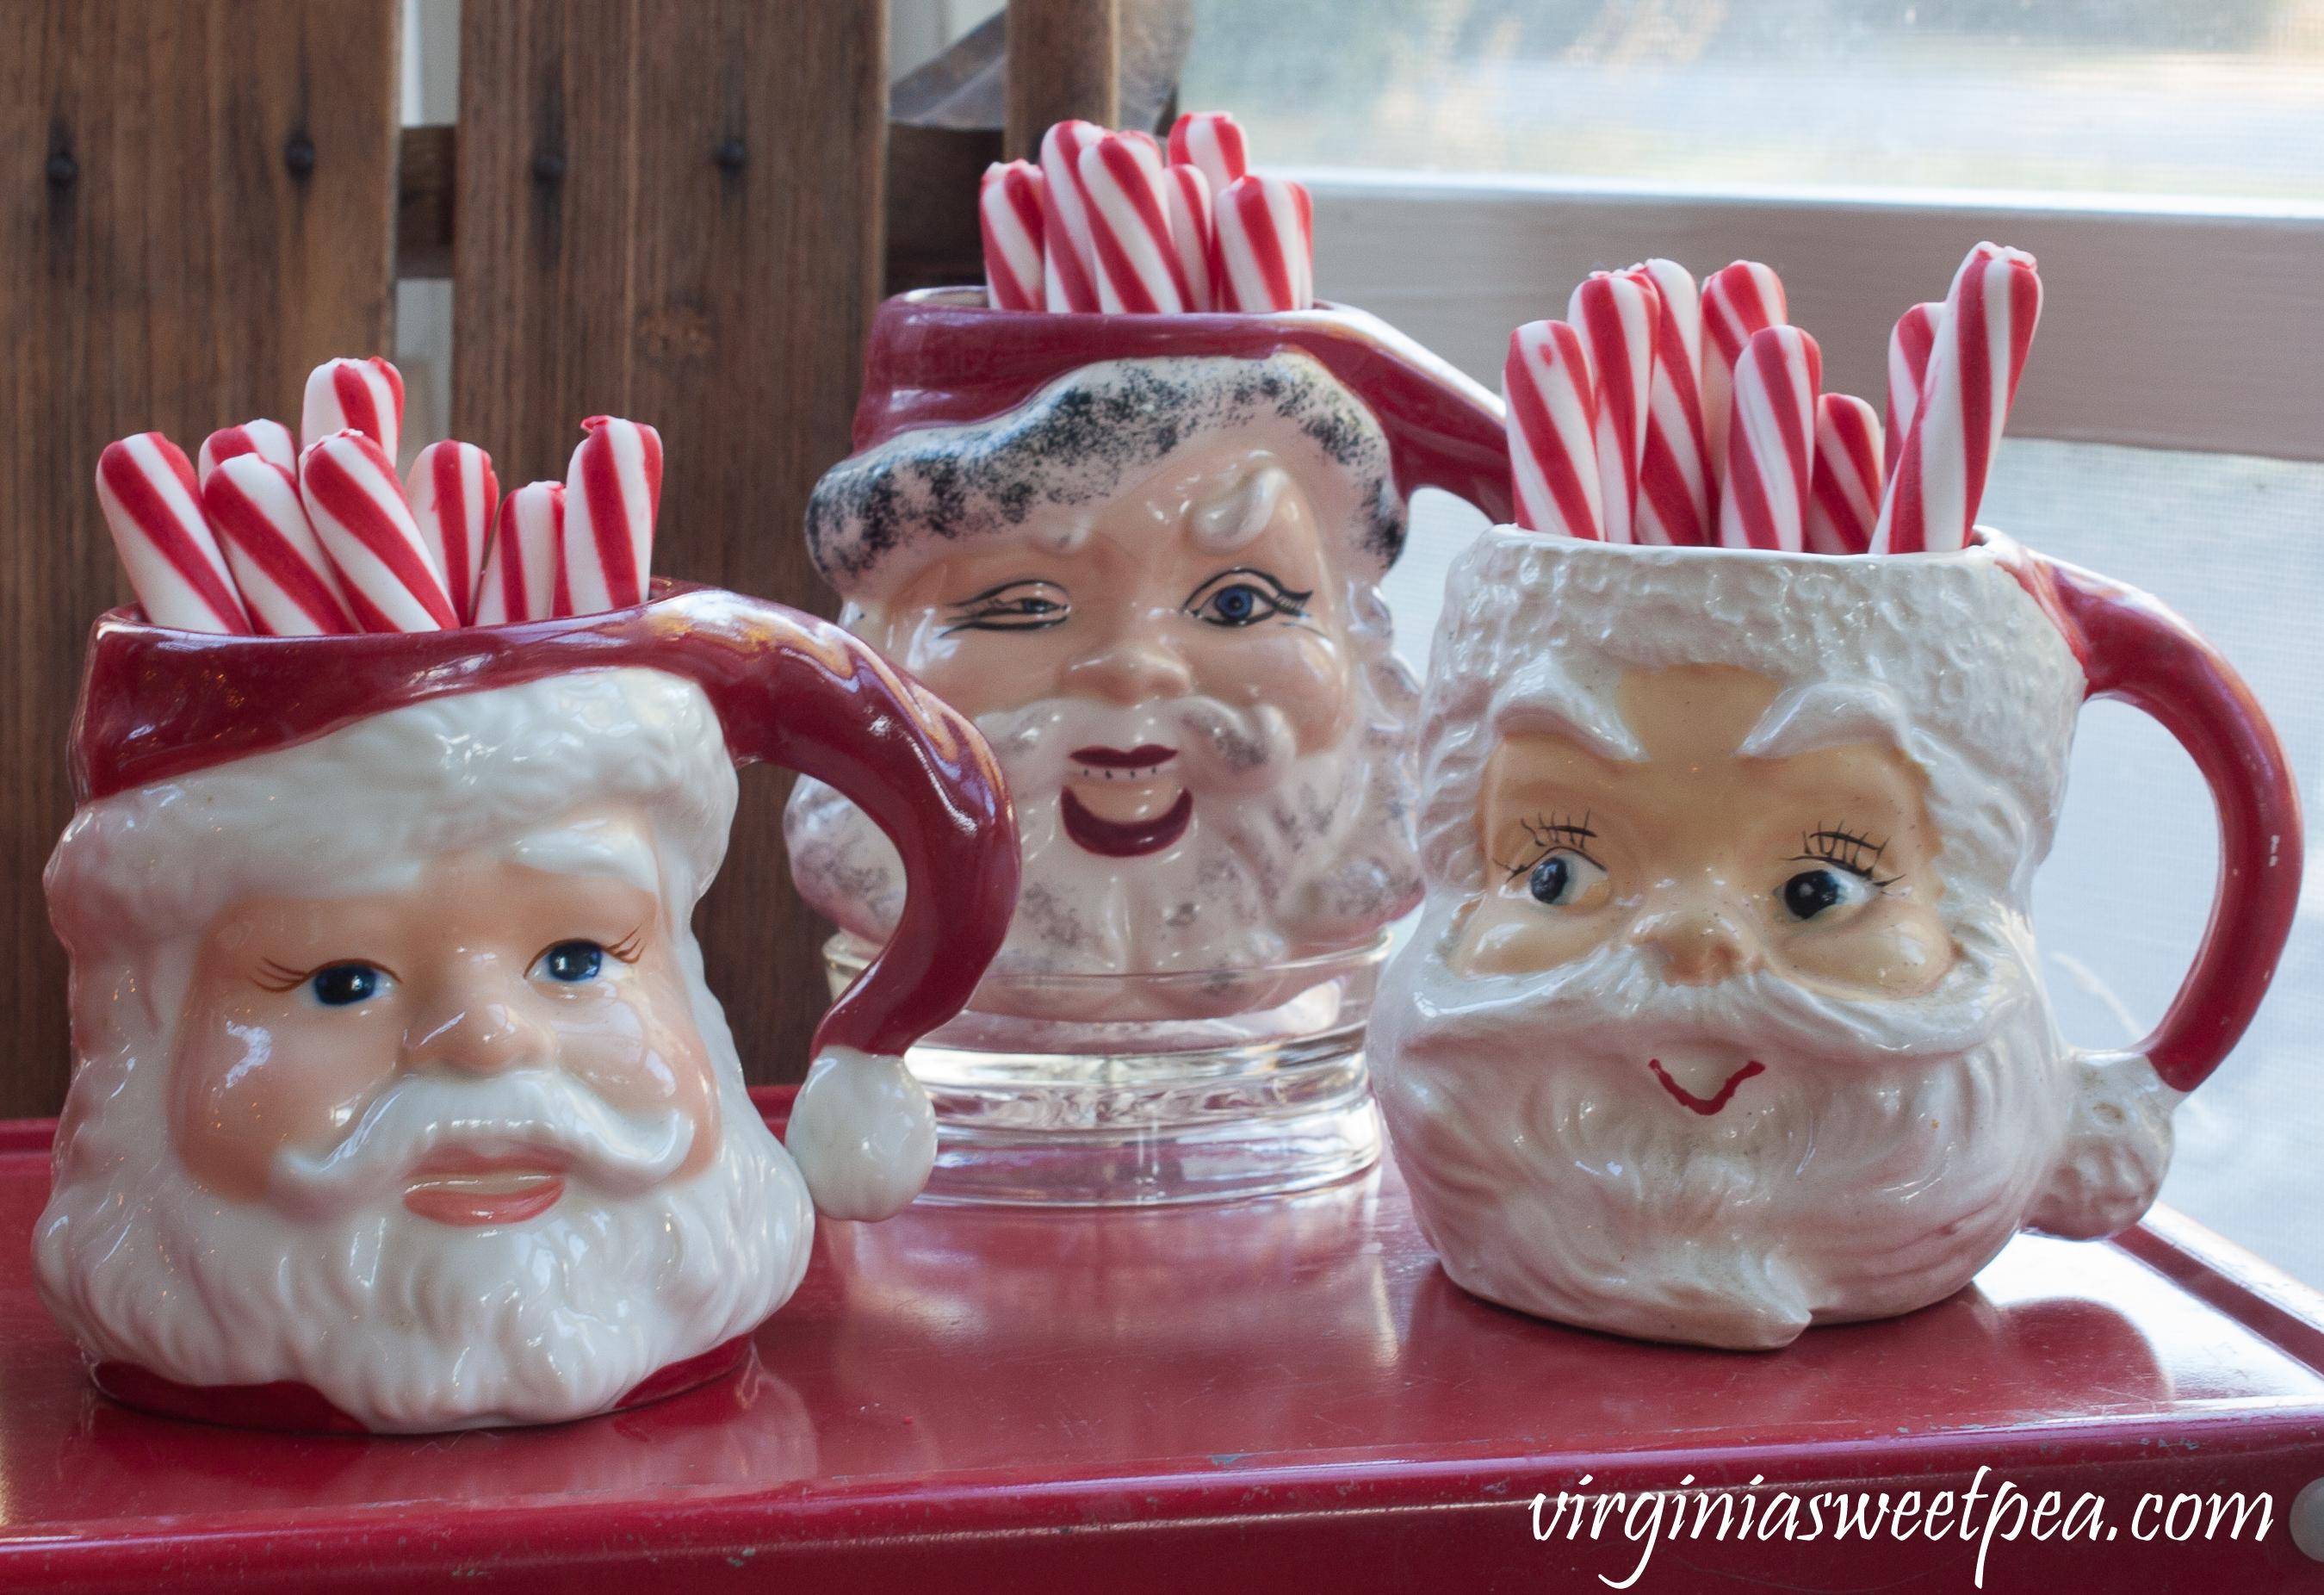 Christmas Porch Vignette - Vintage Santa mugs. #christmas #christmasdecorations #christmasporch #vintage #vintagechristmas